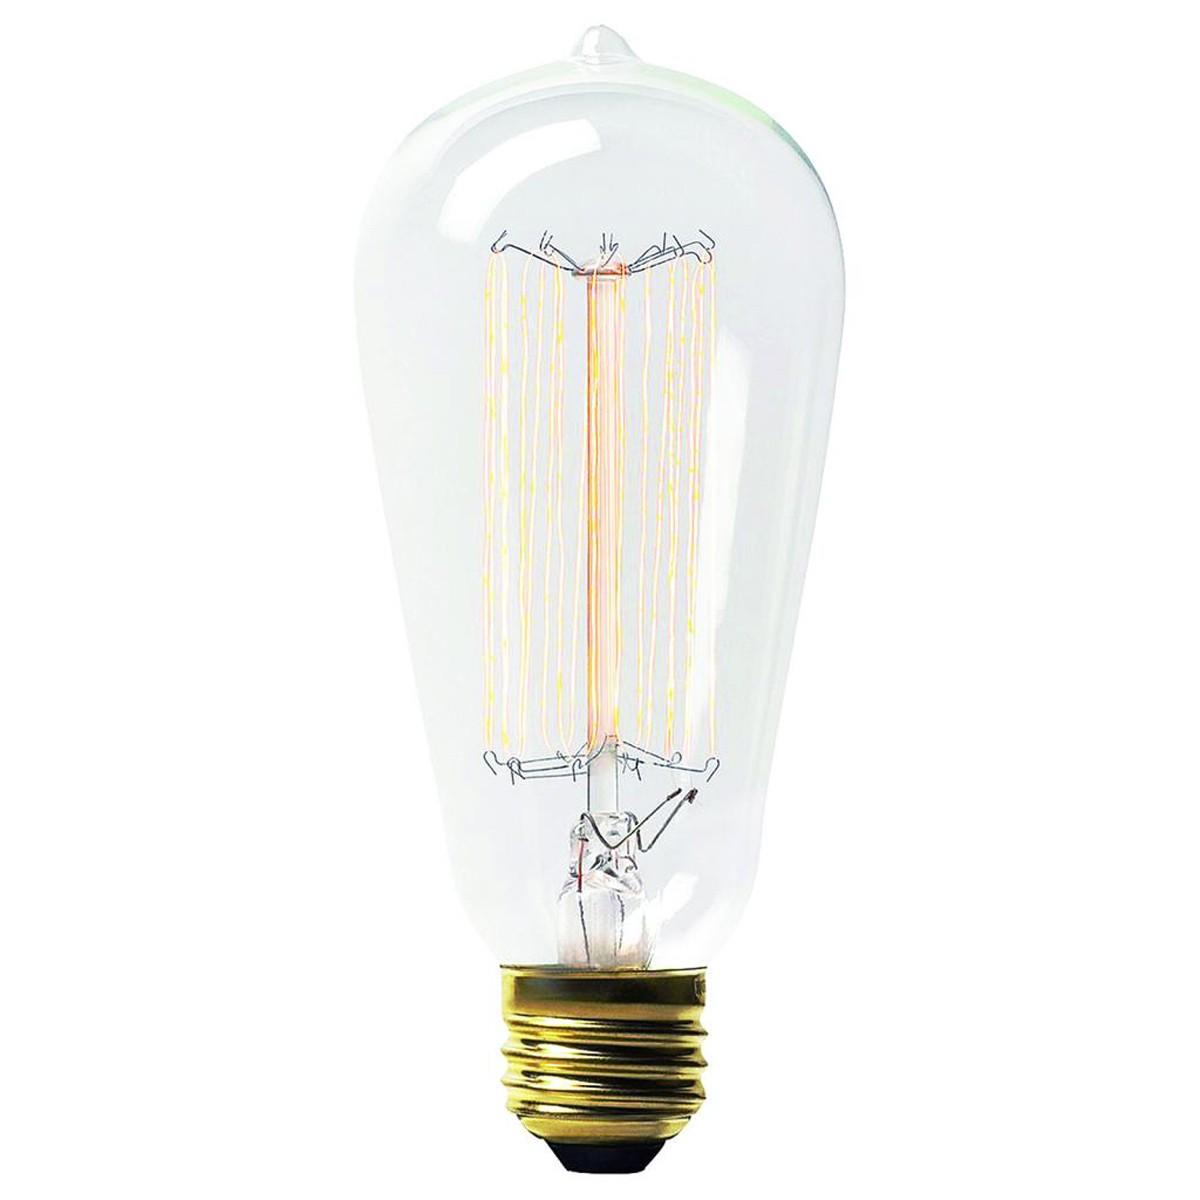 Ren-Wil Retro Light Bulb